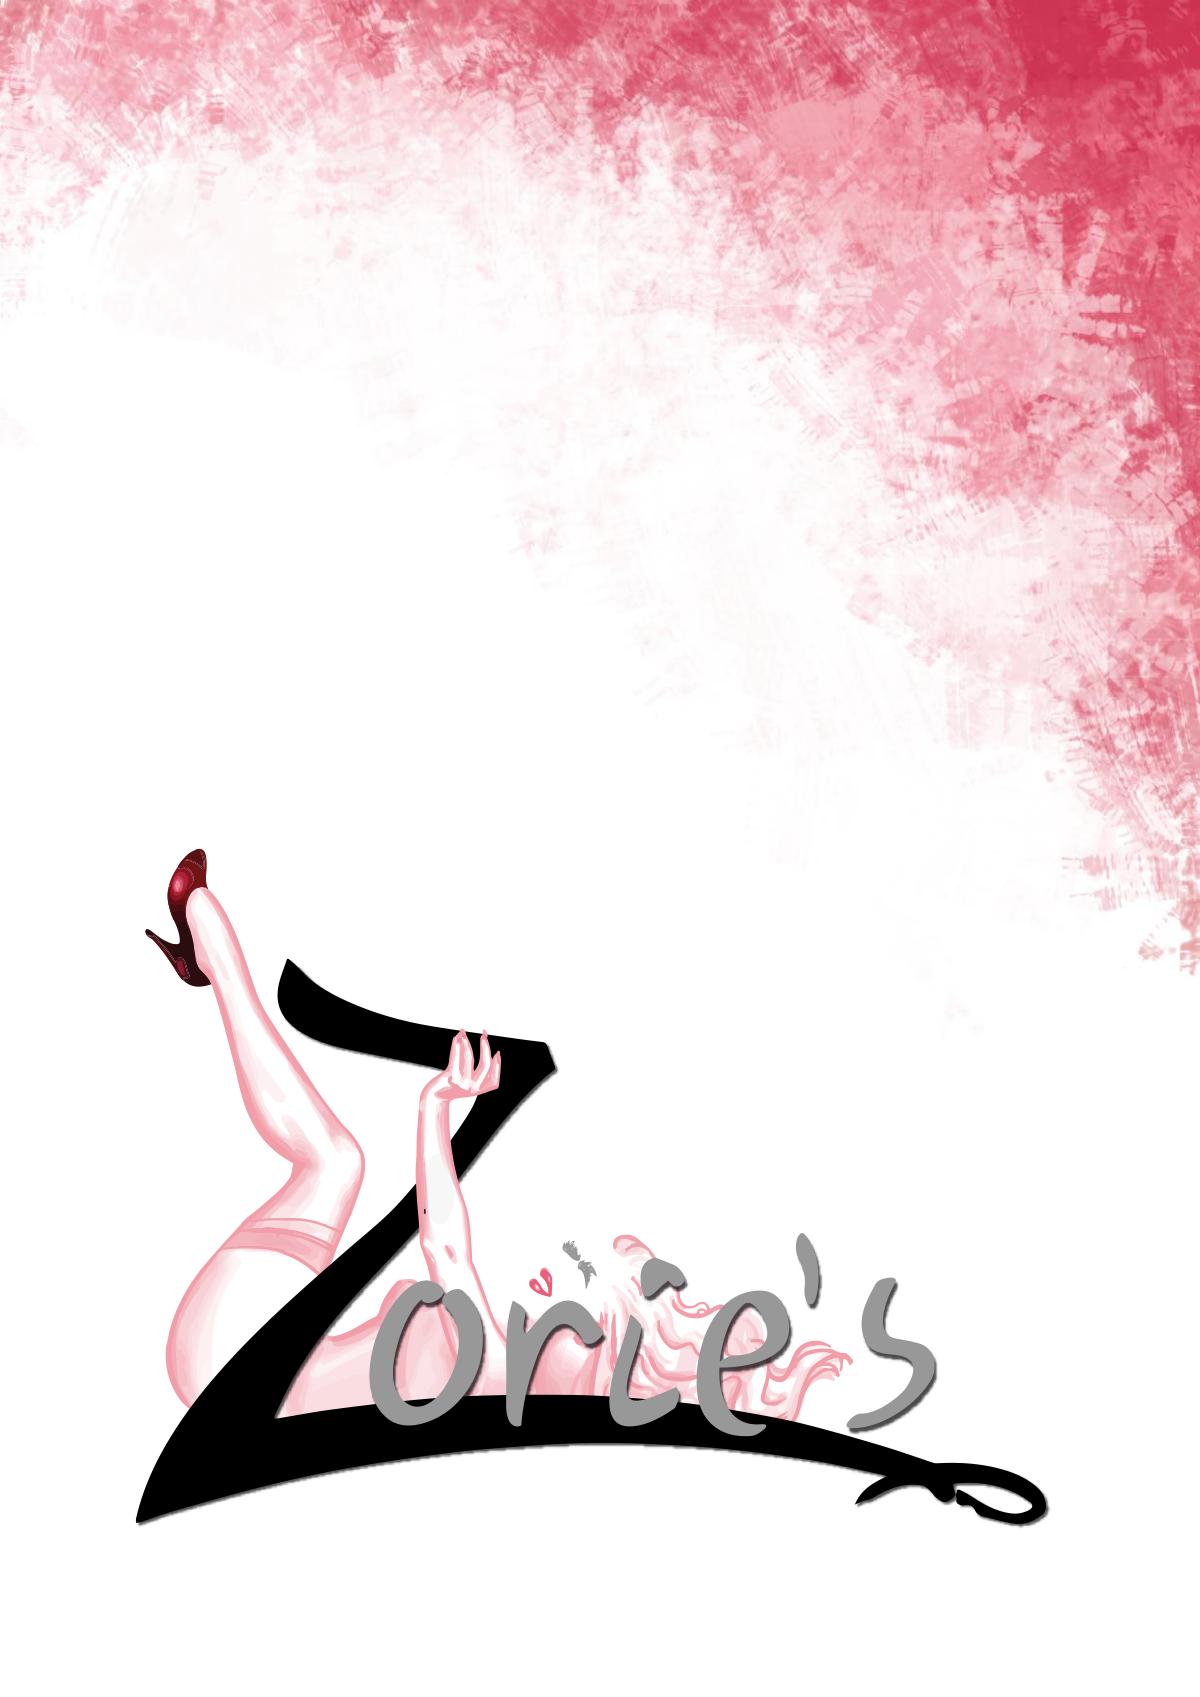 Zorie's